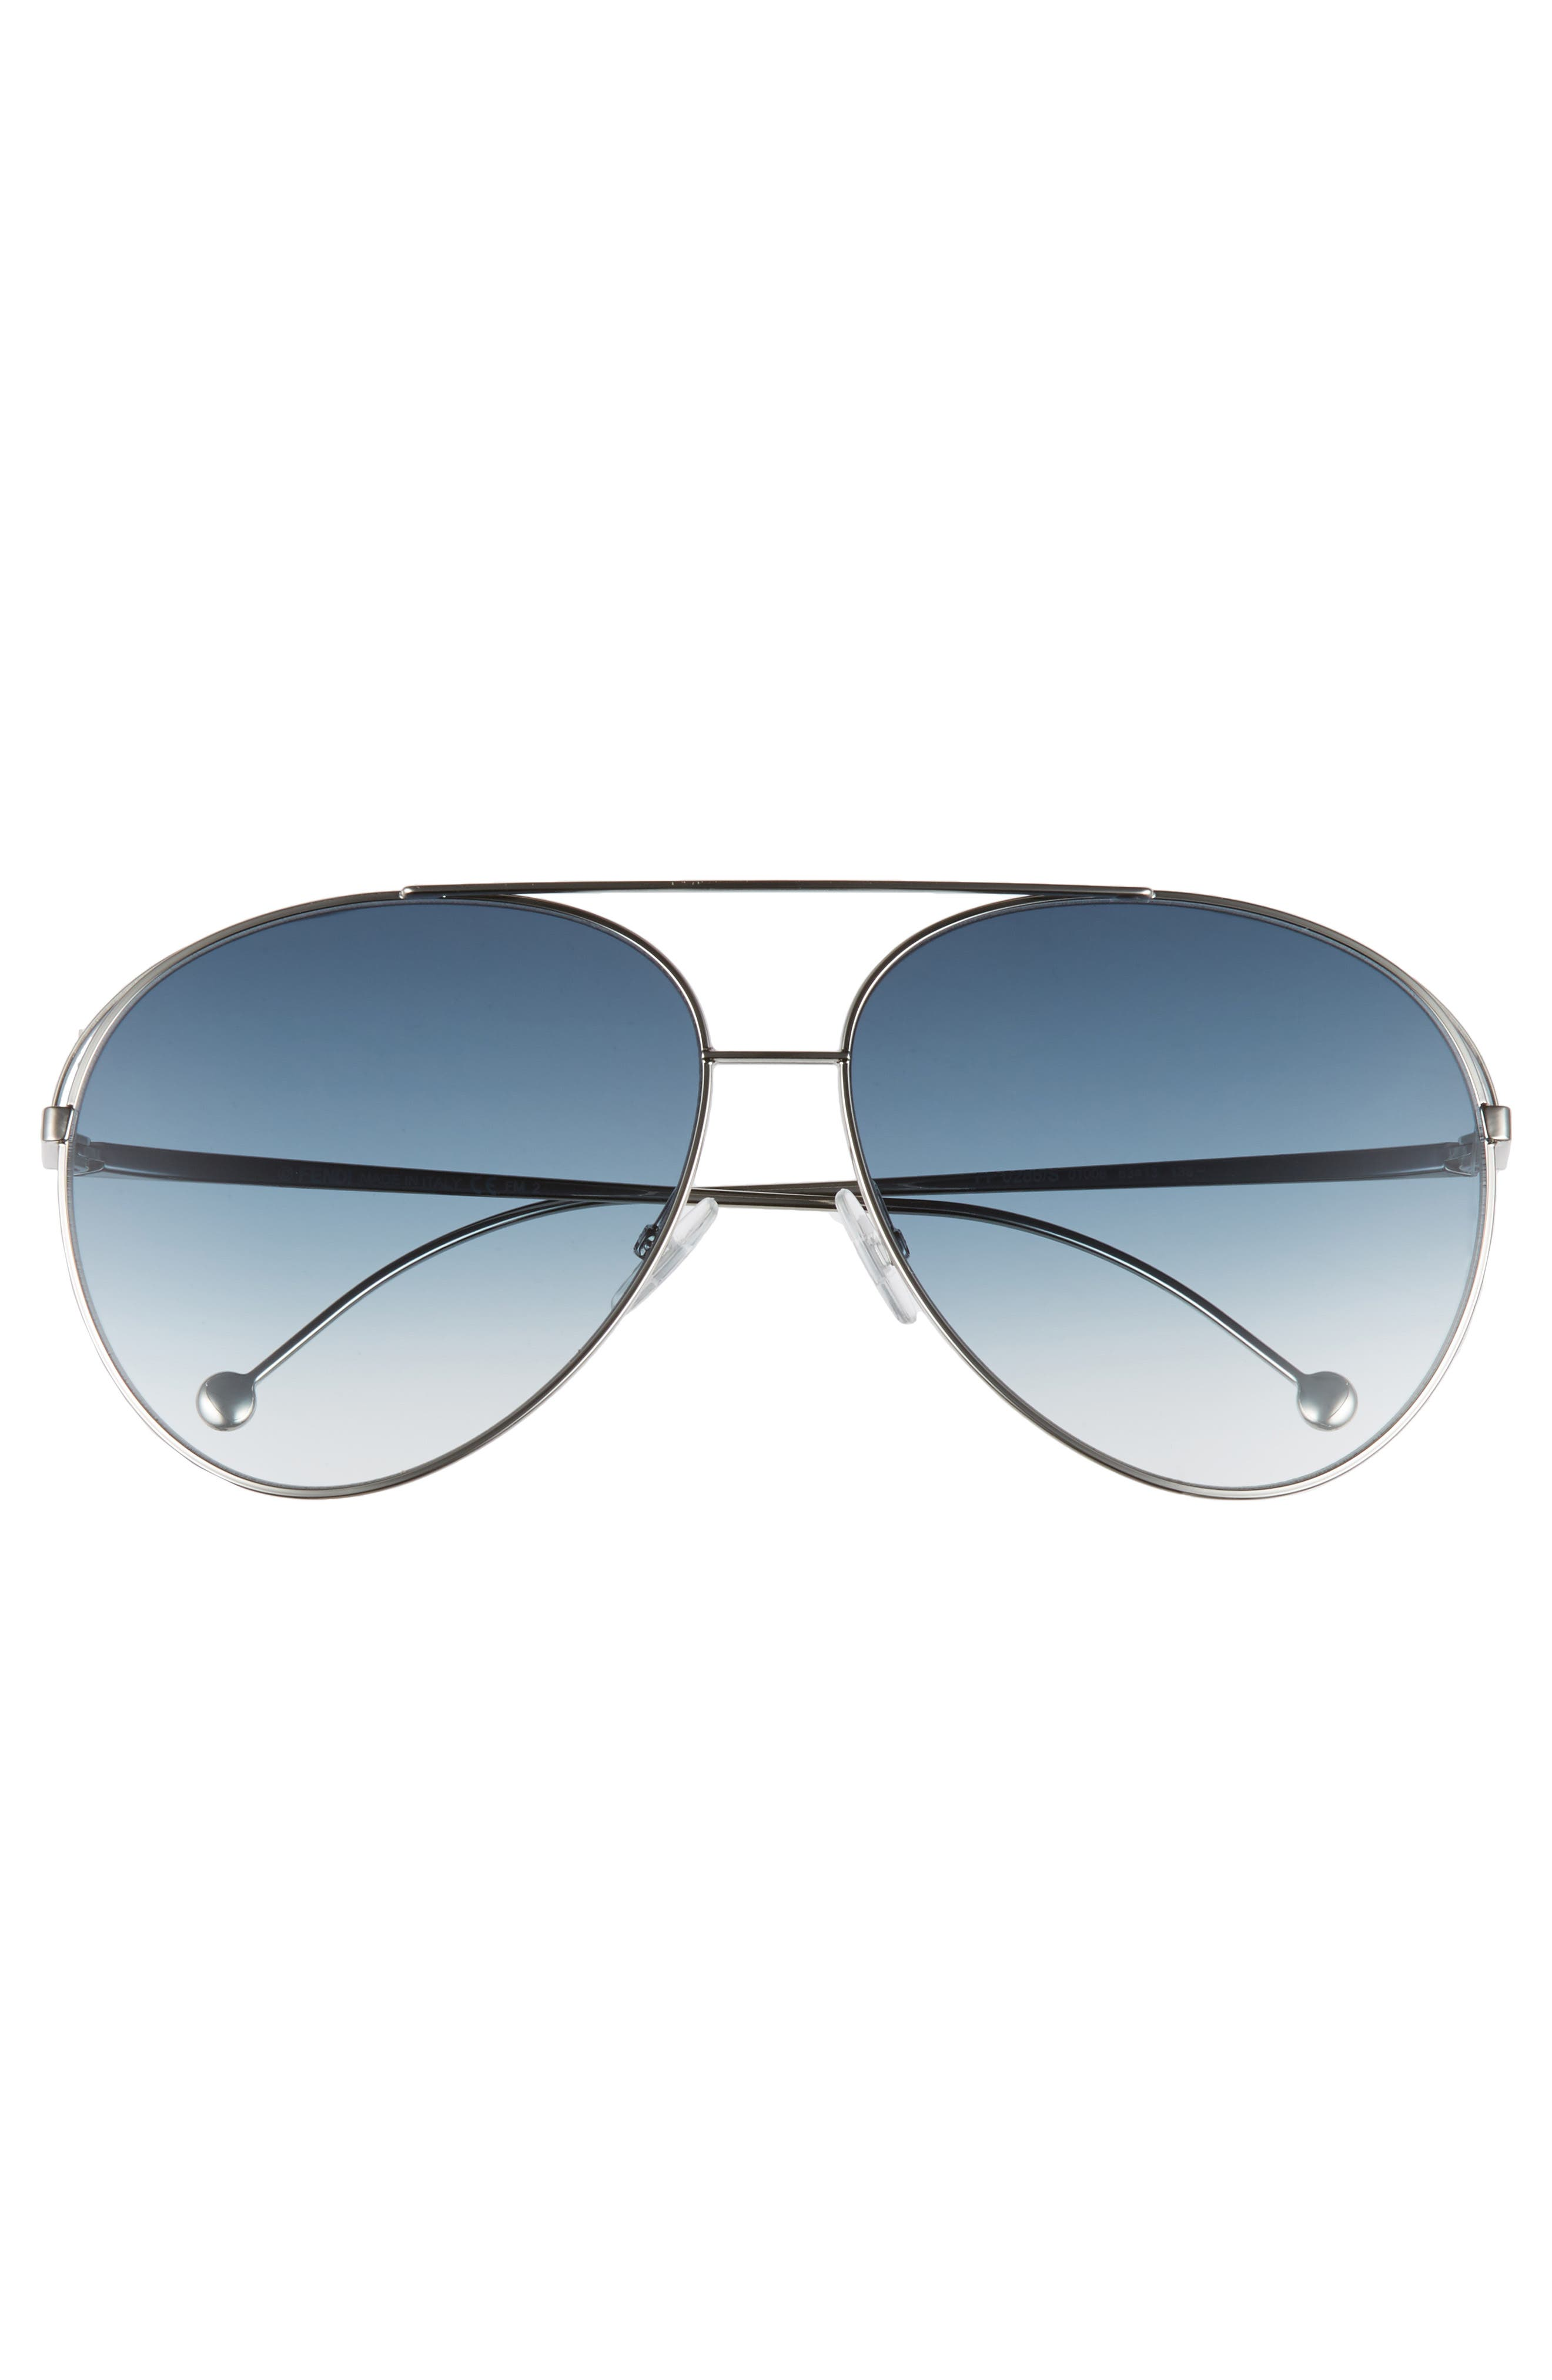 52mm Aviator Sunglasses,                             Alternate thumbnail 3, color,                             PALLADIUM